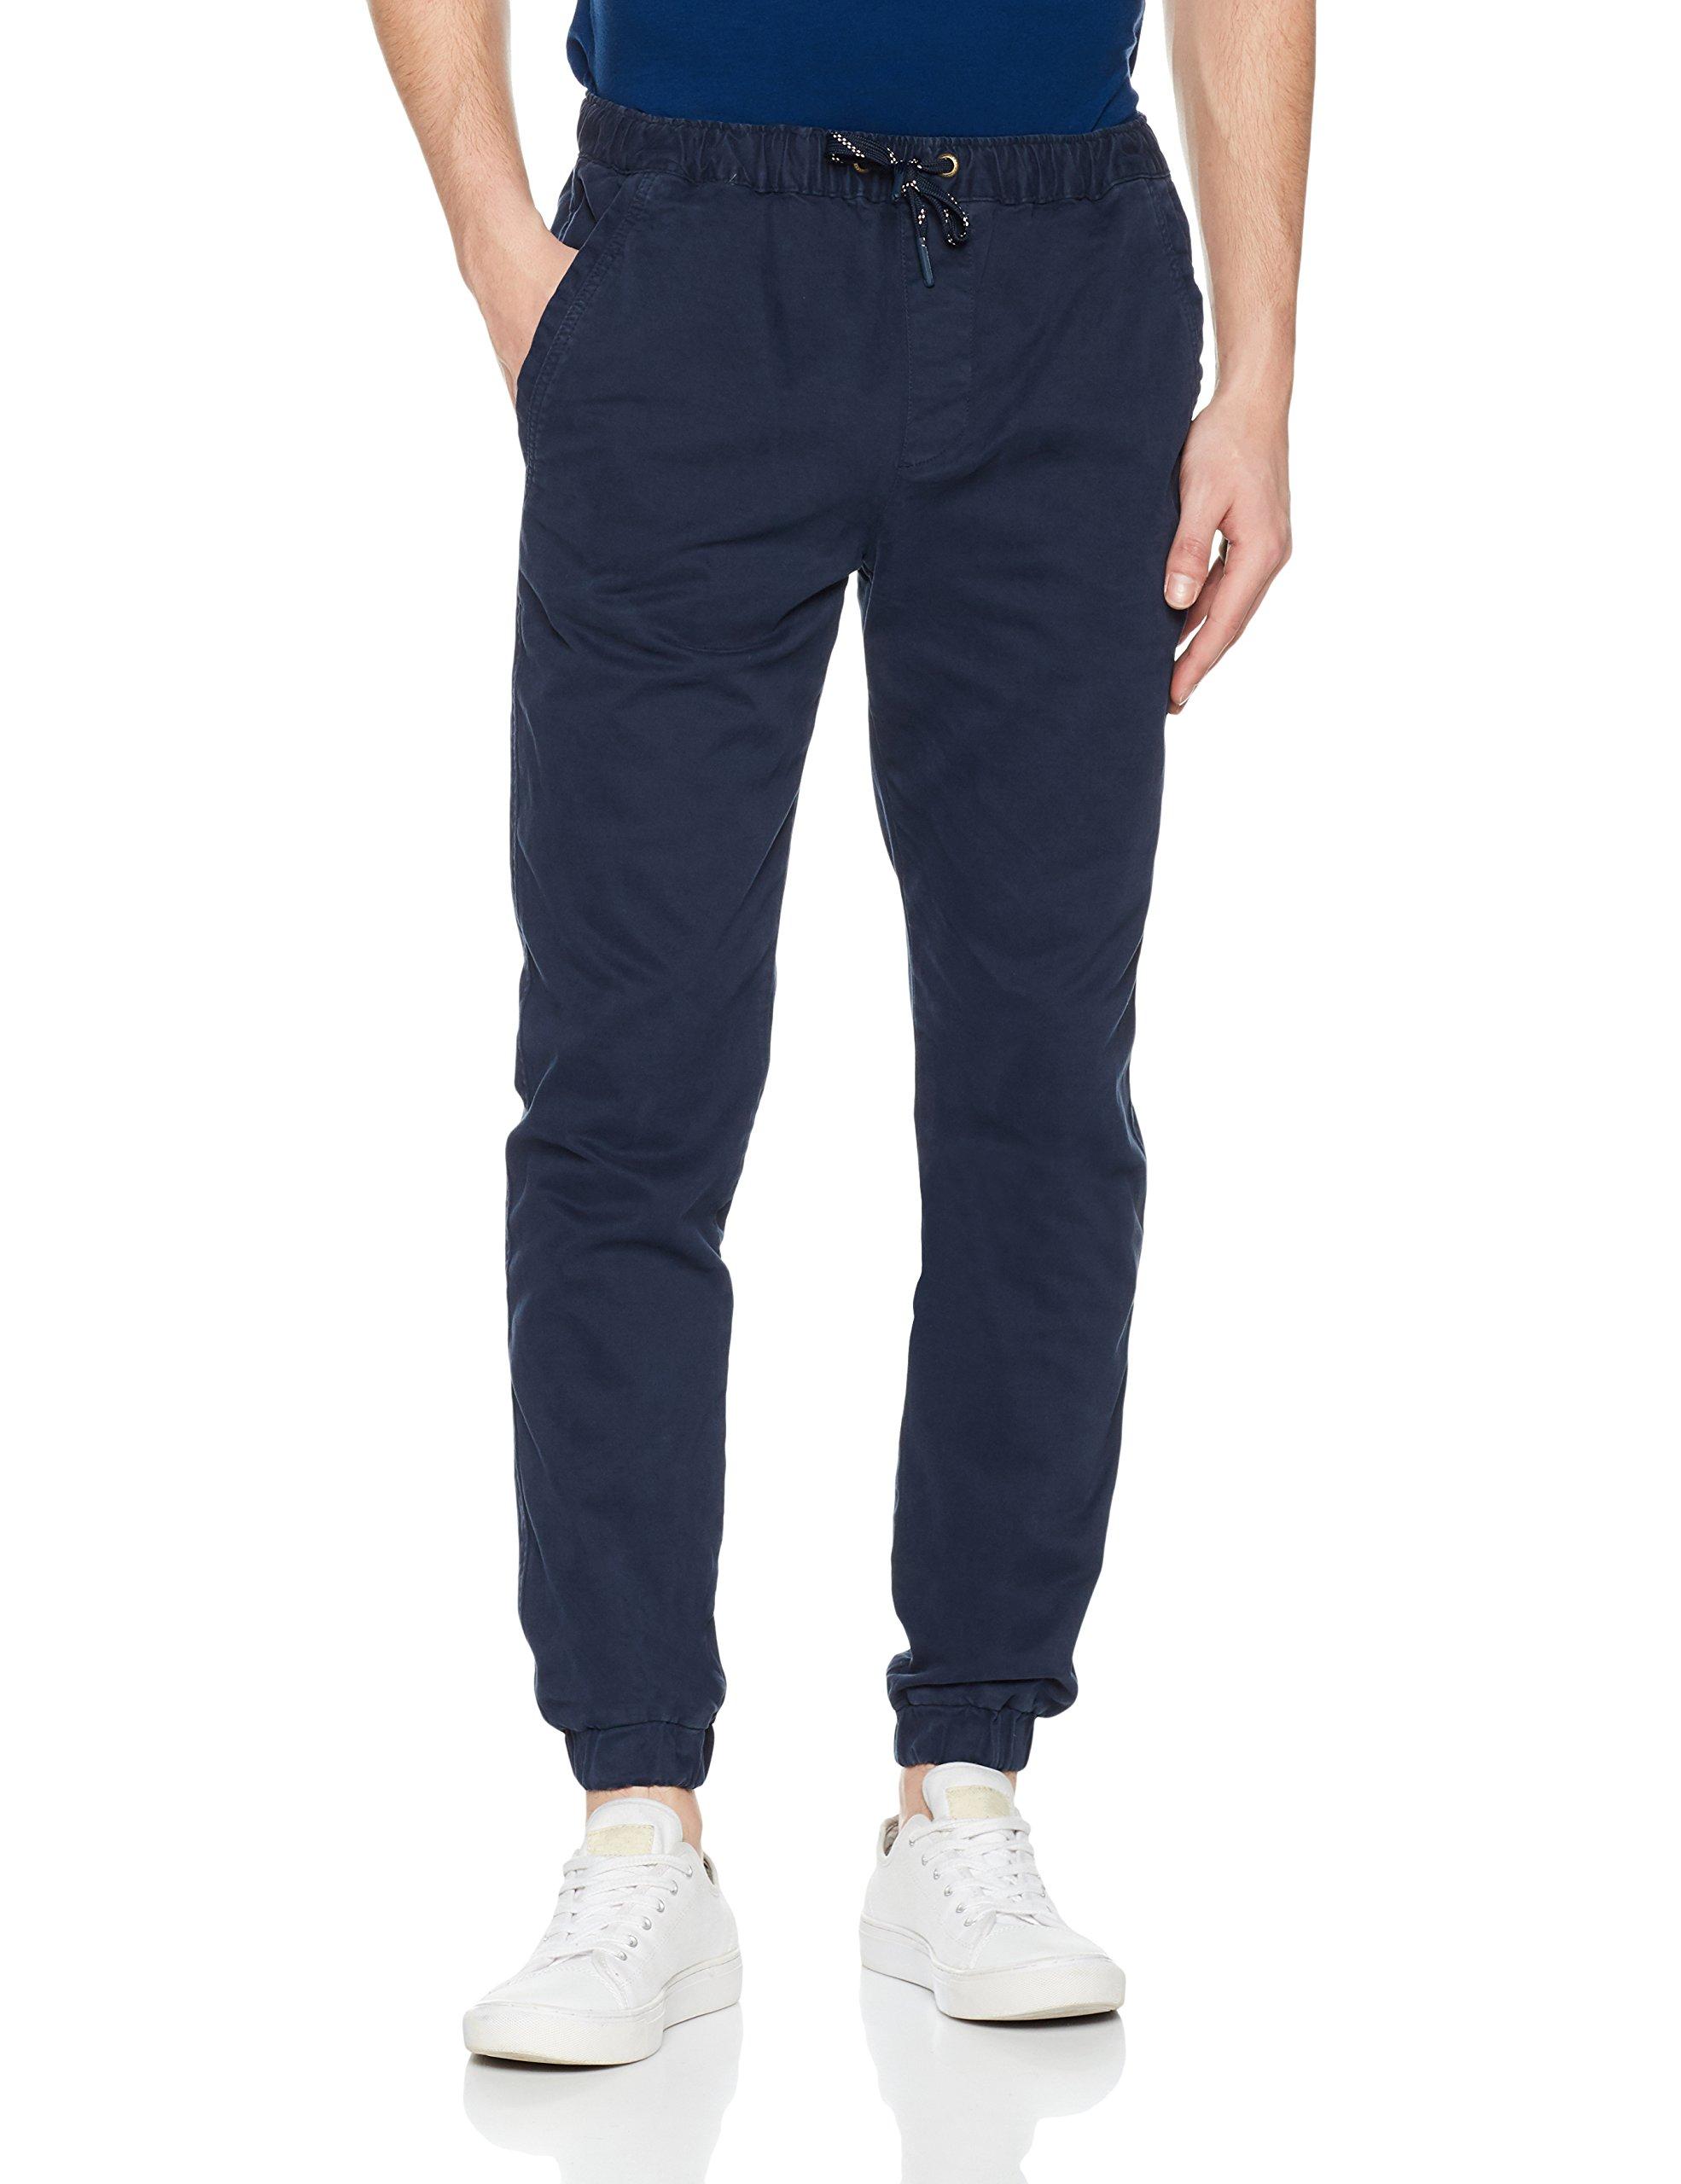 Str Tommy Jog Jeans Slim 002W32 Iris Fabricant3232 Rlx Pantalon Bleublack l32taille Homme mn0wvNO8